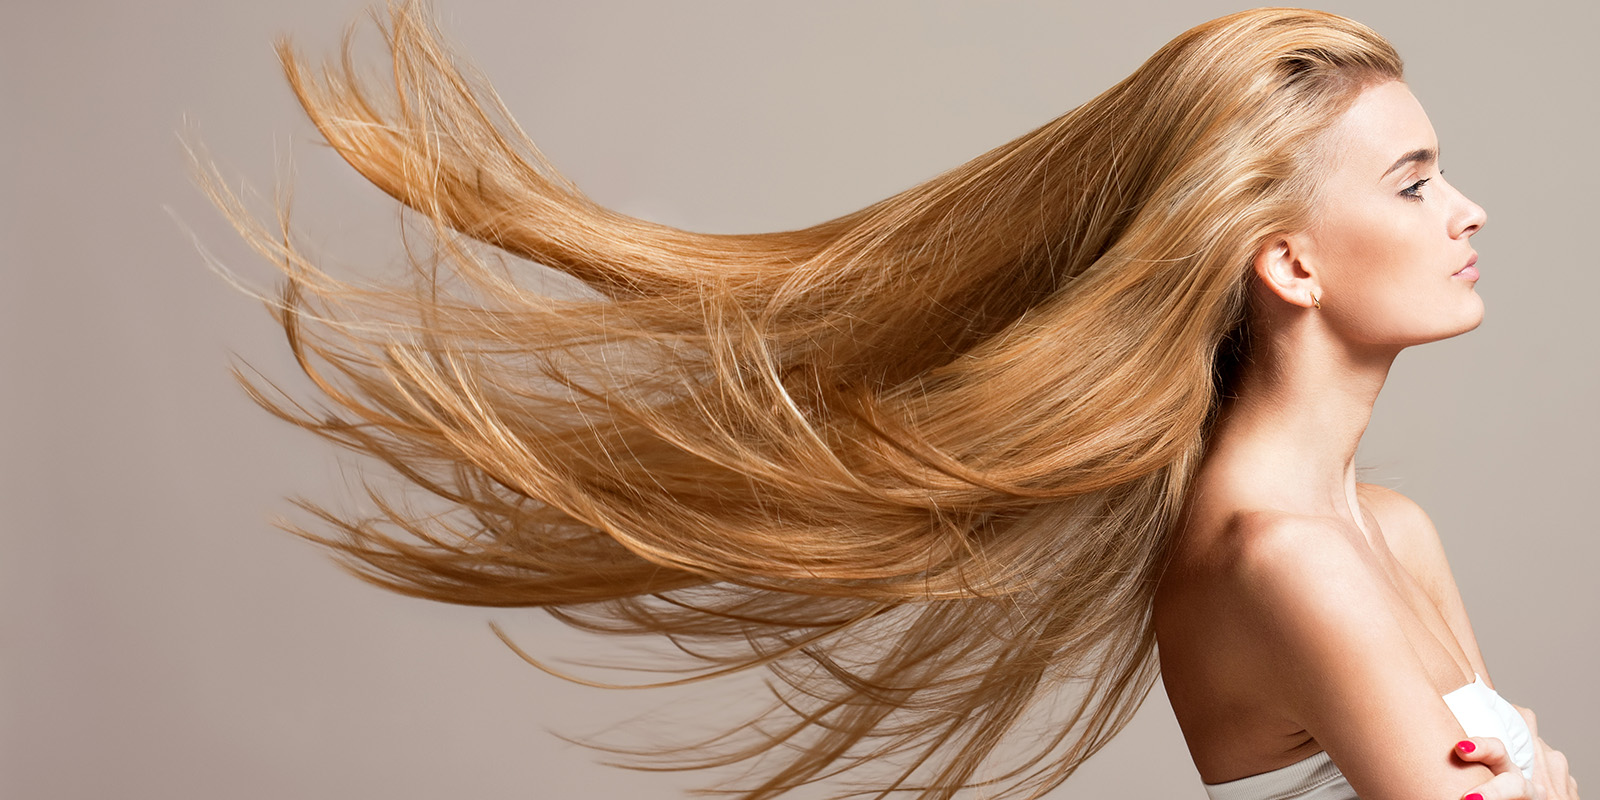 Spa hair treatment, at Vitality Medi-Spa Halifax NS